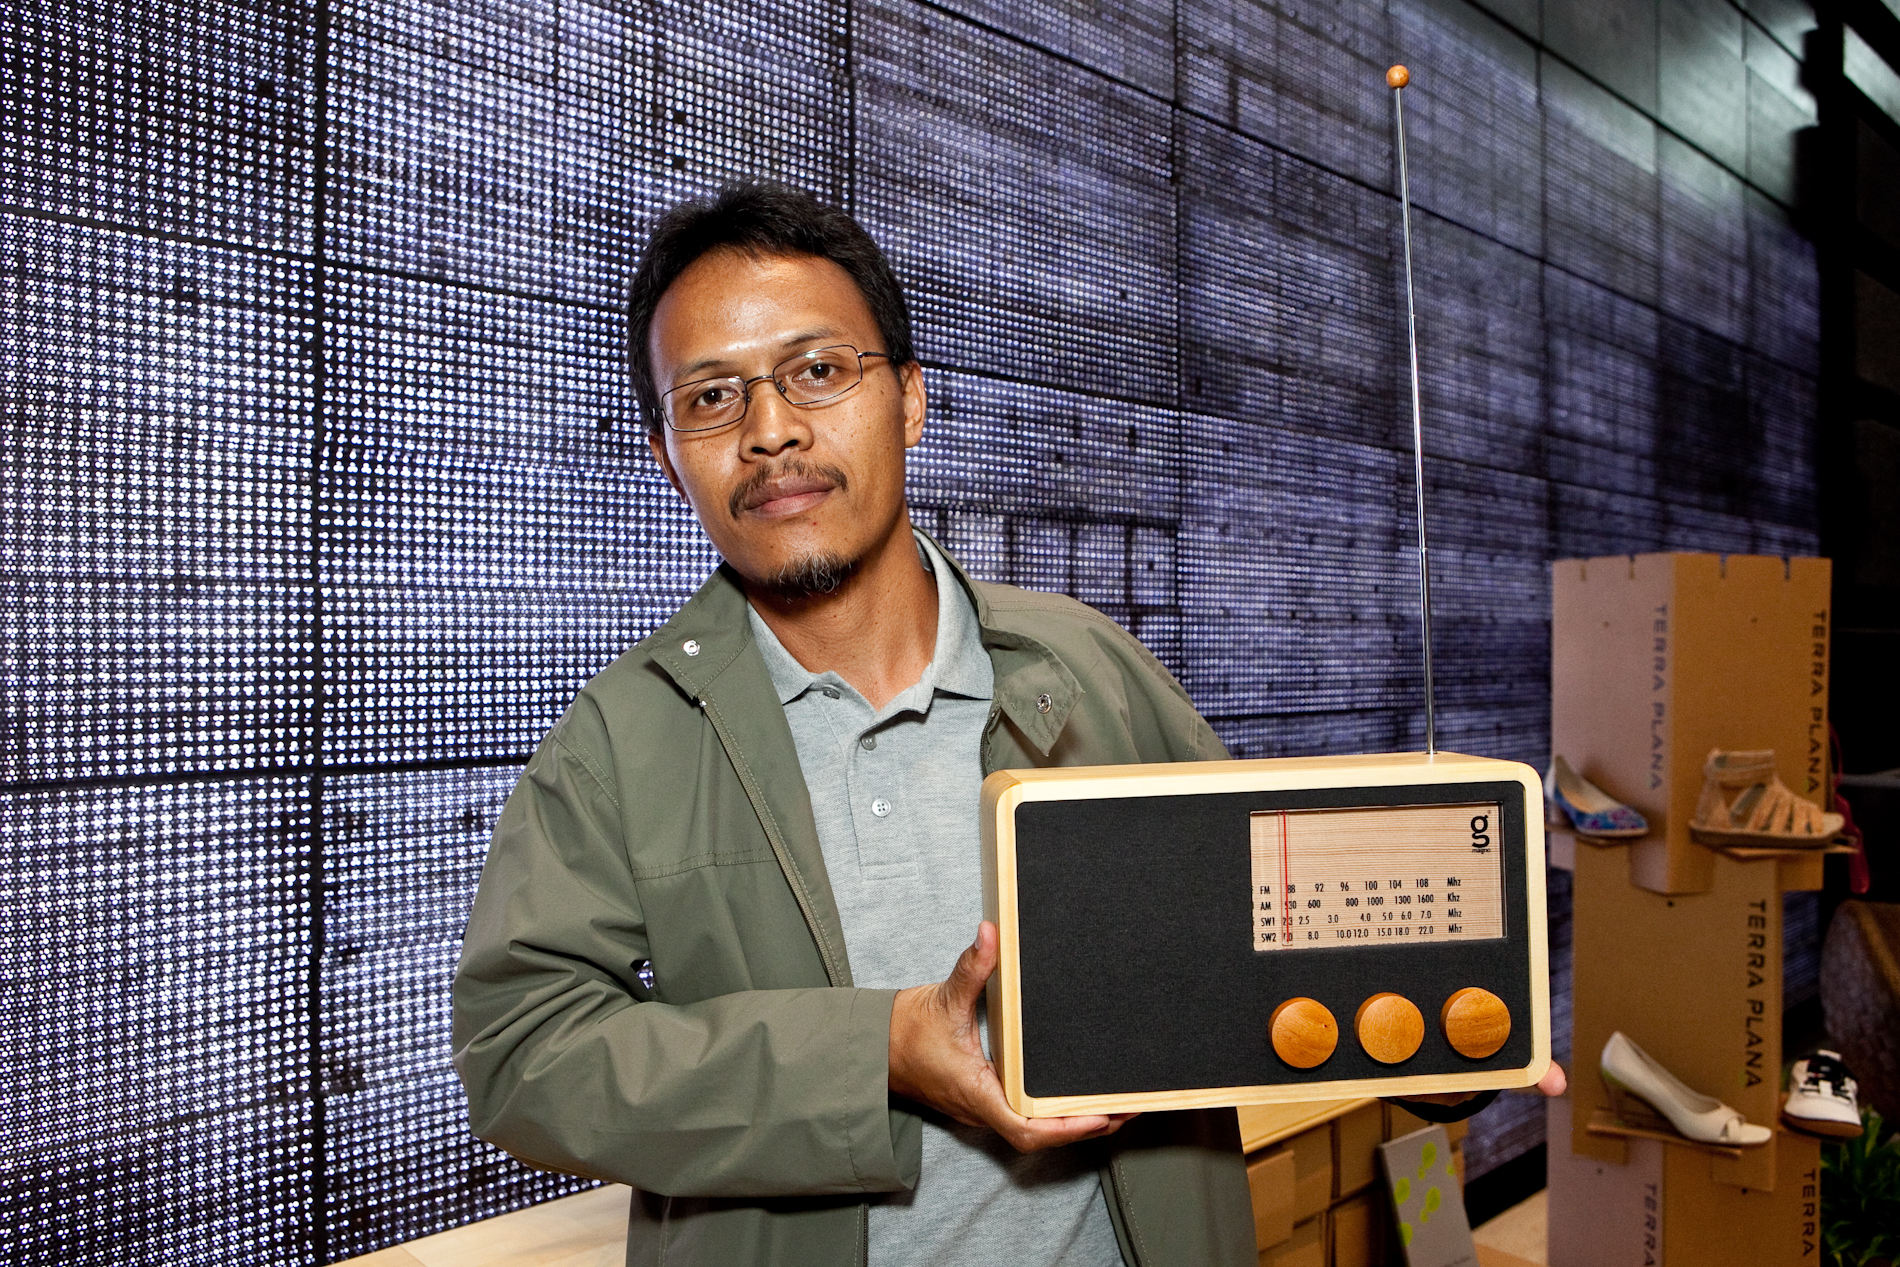 qi-global-2009-sustaible-design-singapore-054.jpg